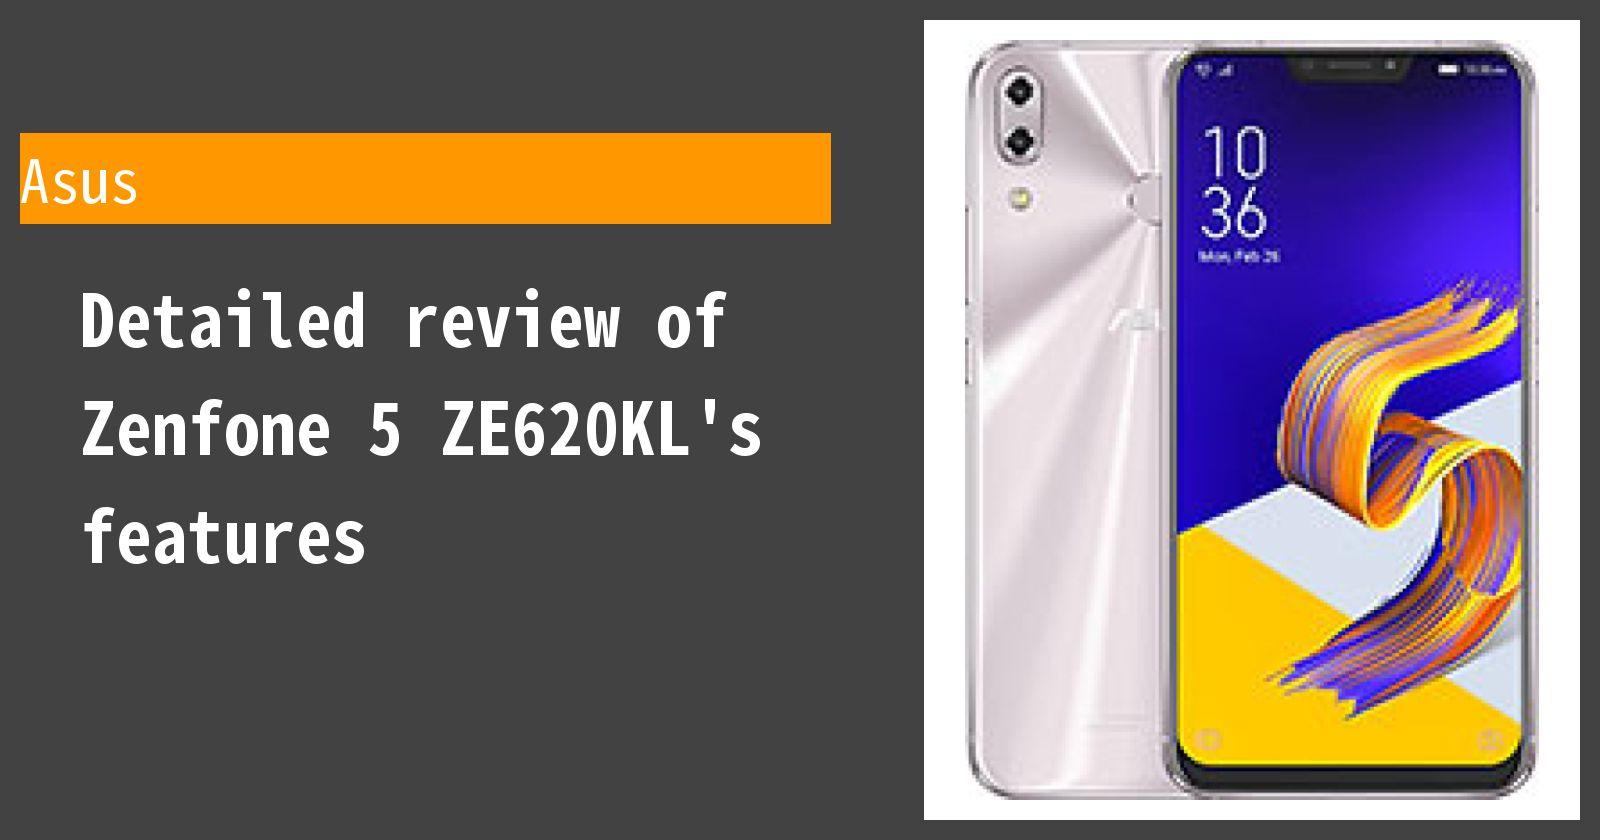 Detailed review of Zenfone 5 ZE620KL's features